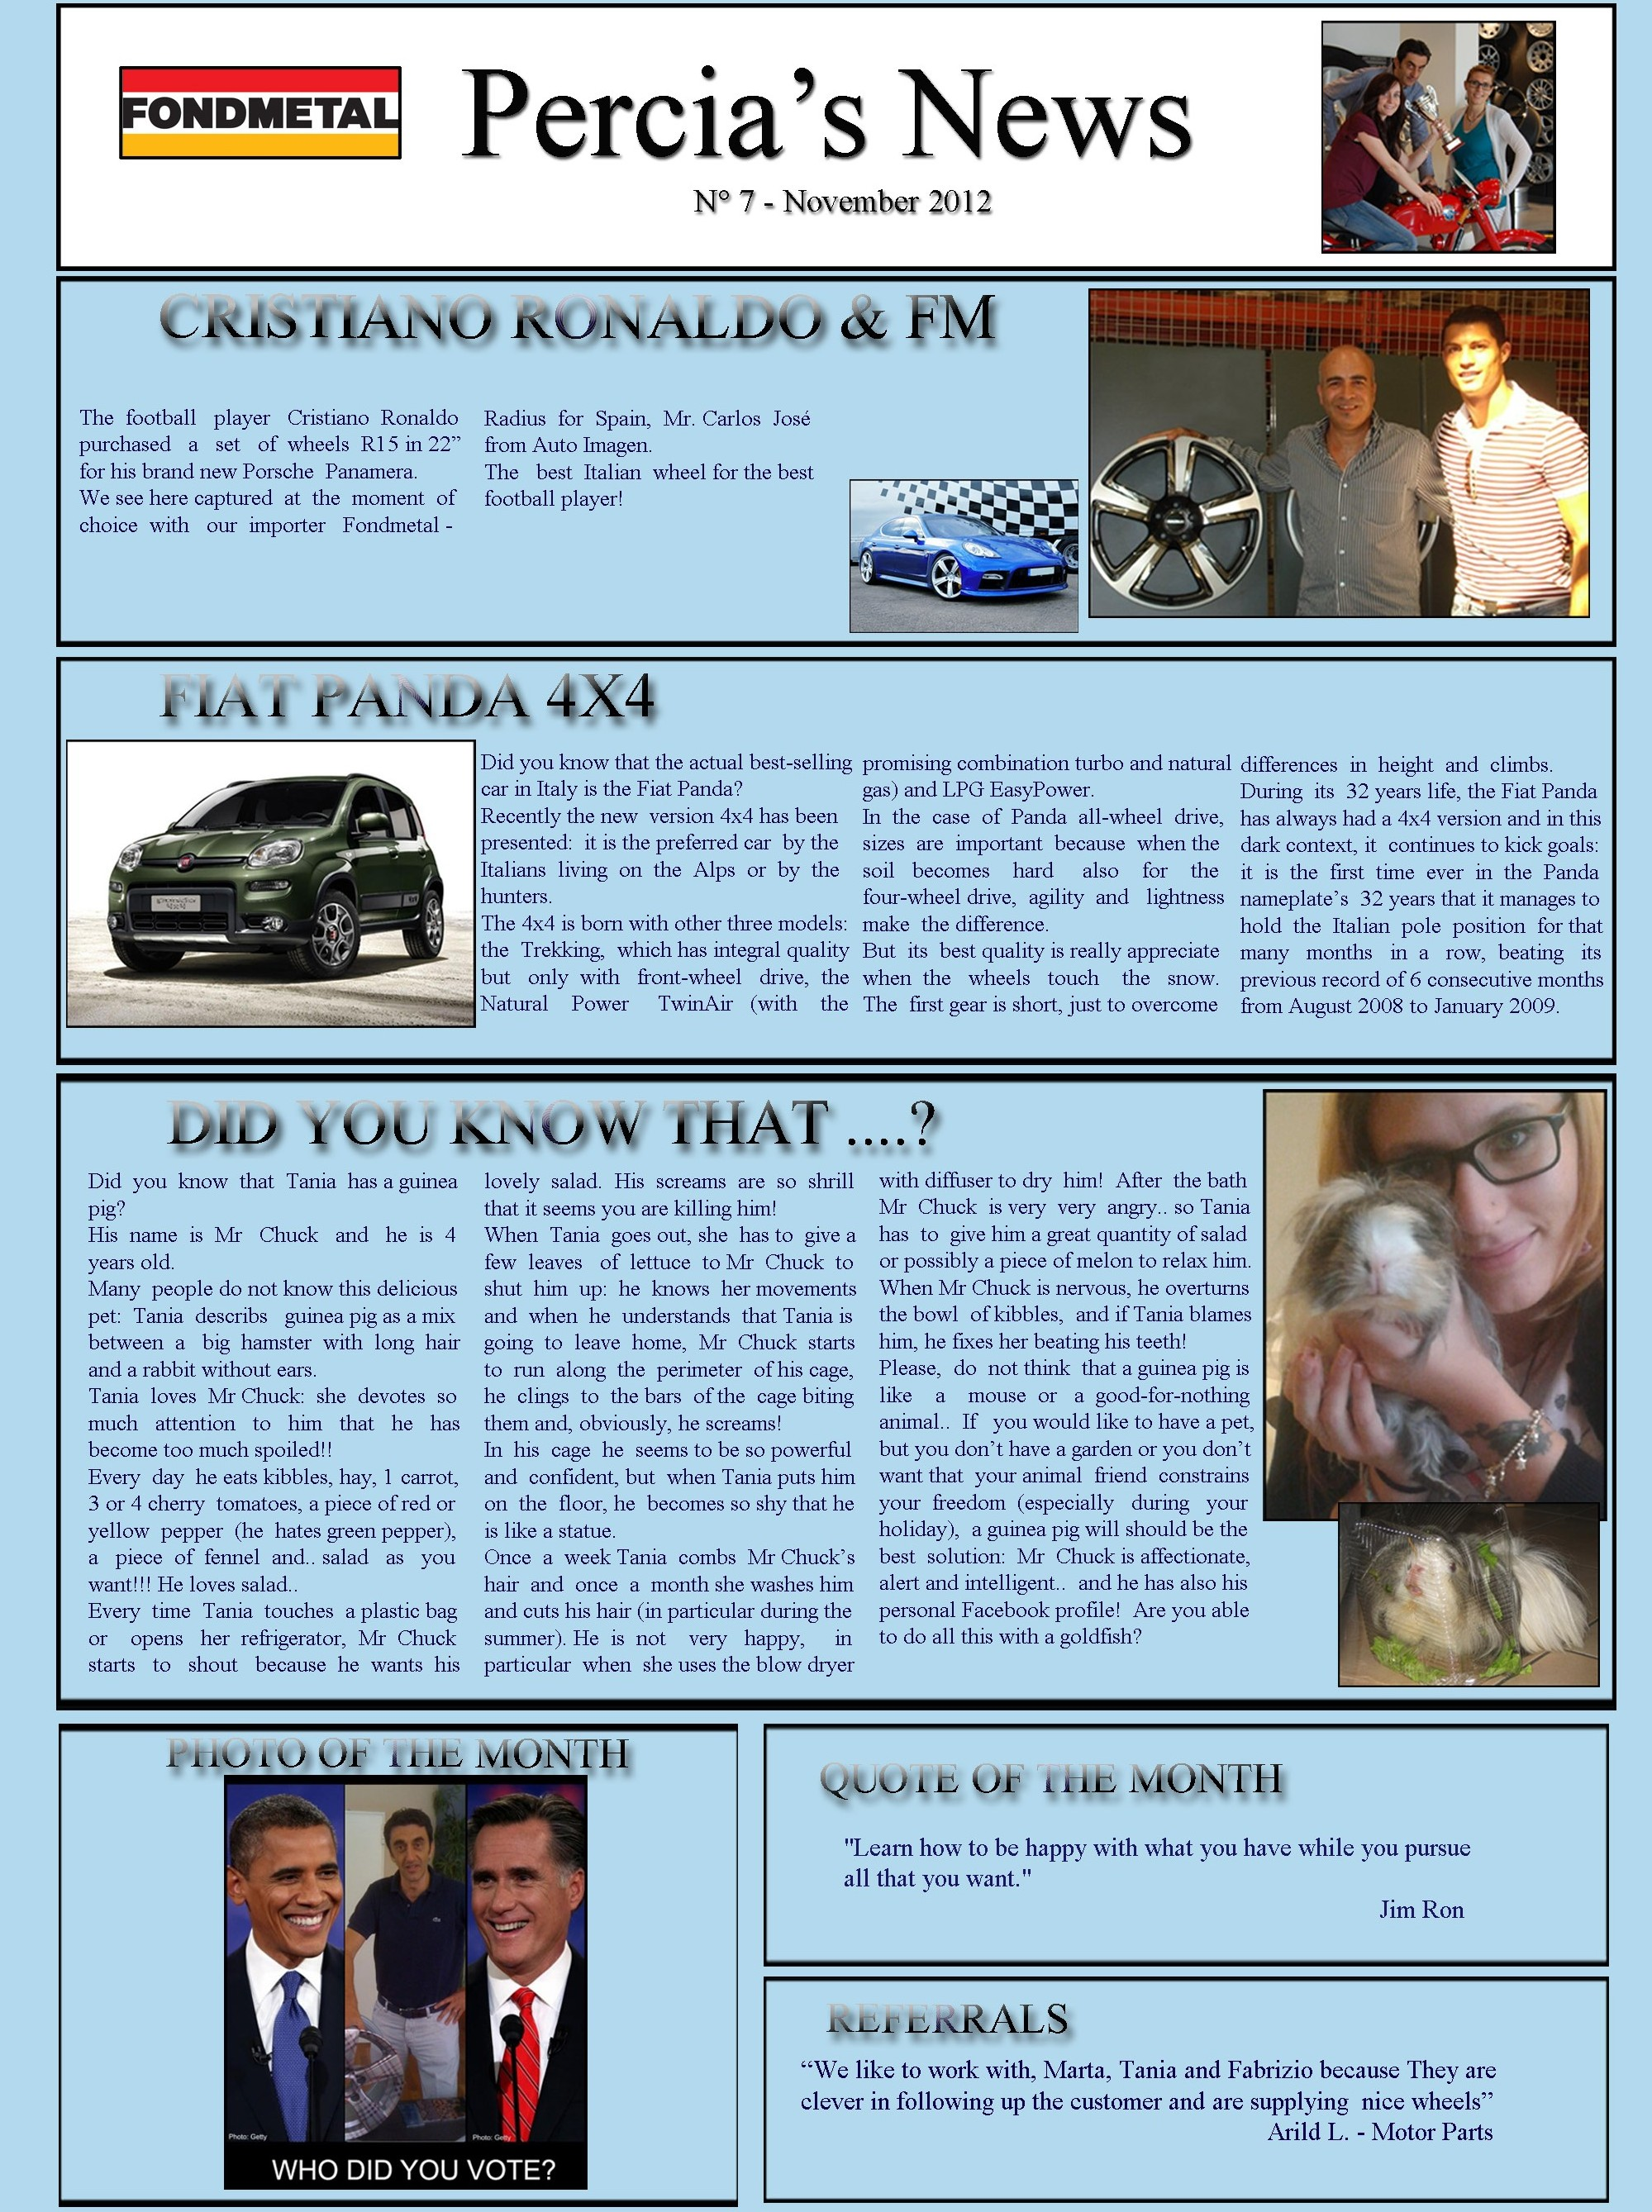 PERCIA'S NEWS NOVEMBER 2012